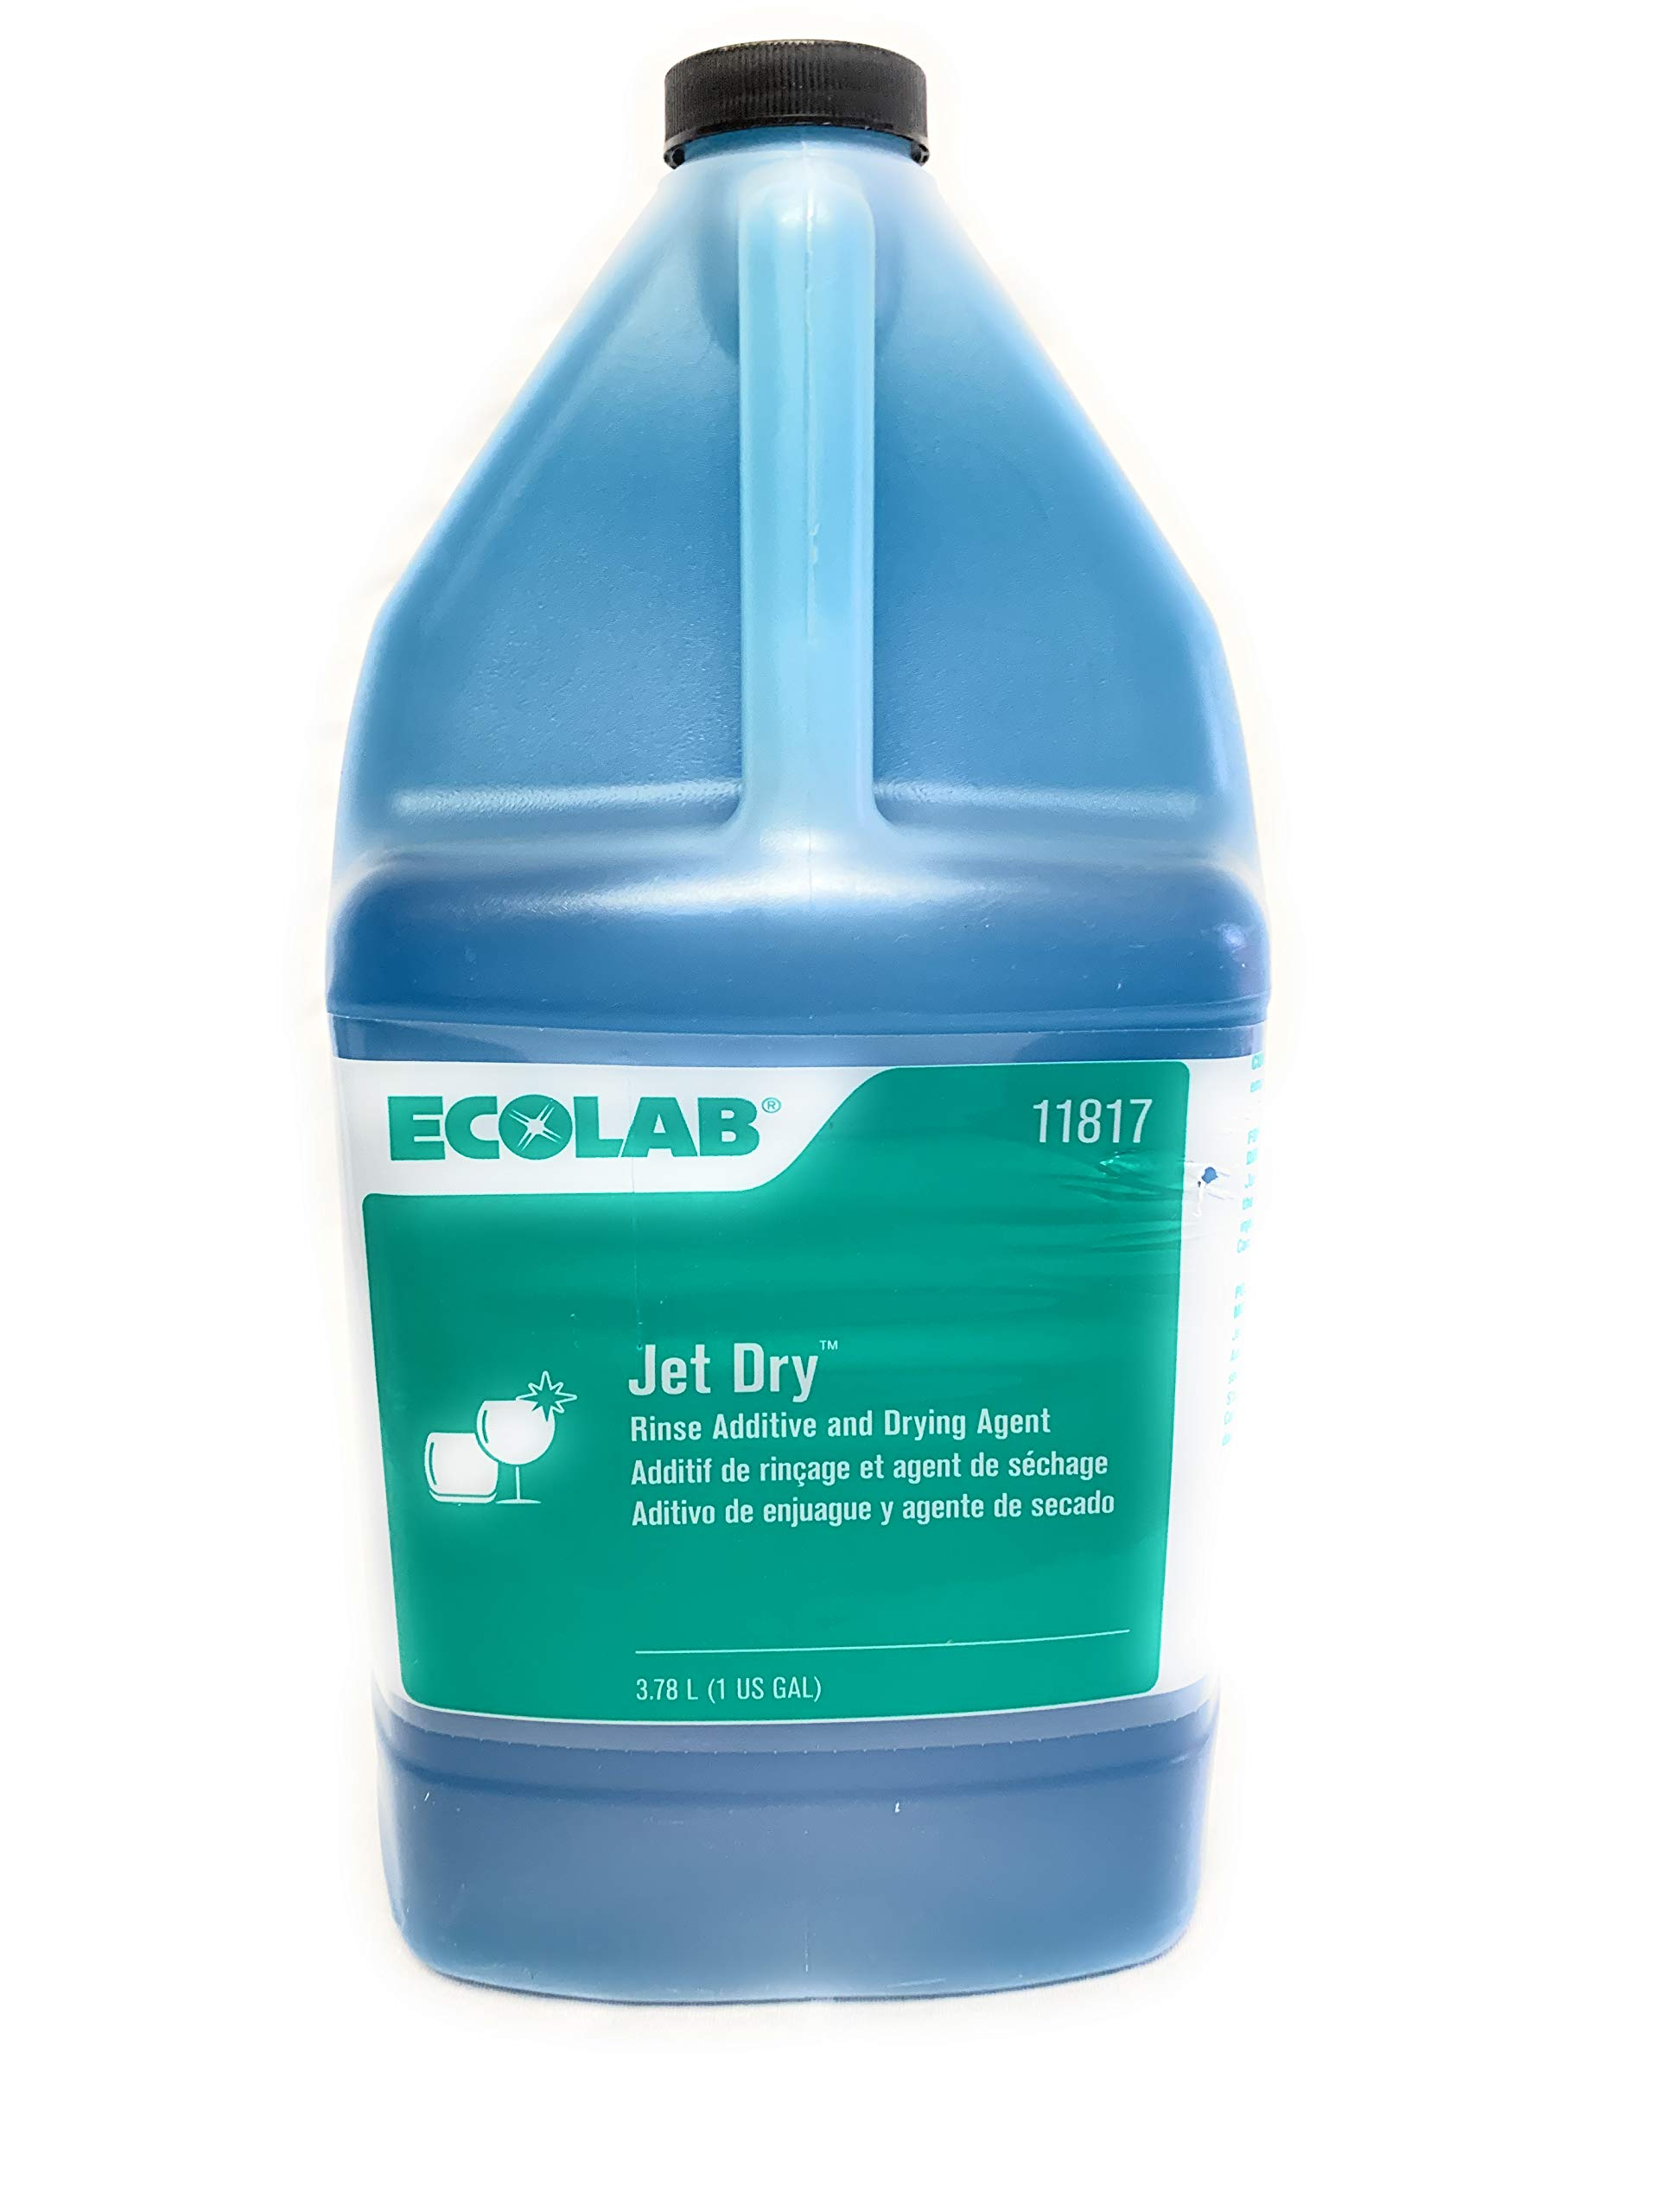 Ecolab JET DRY Dish Washware Rinse Additive Drying Agent - 1 Gallon